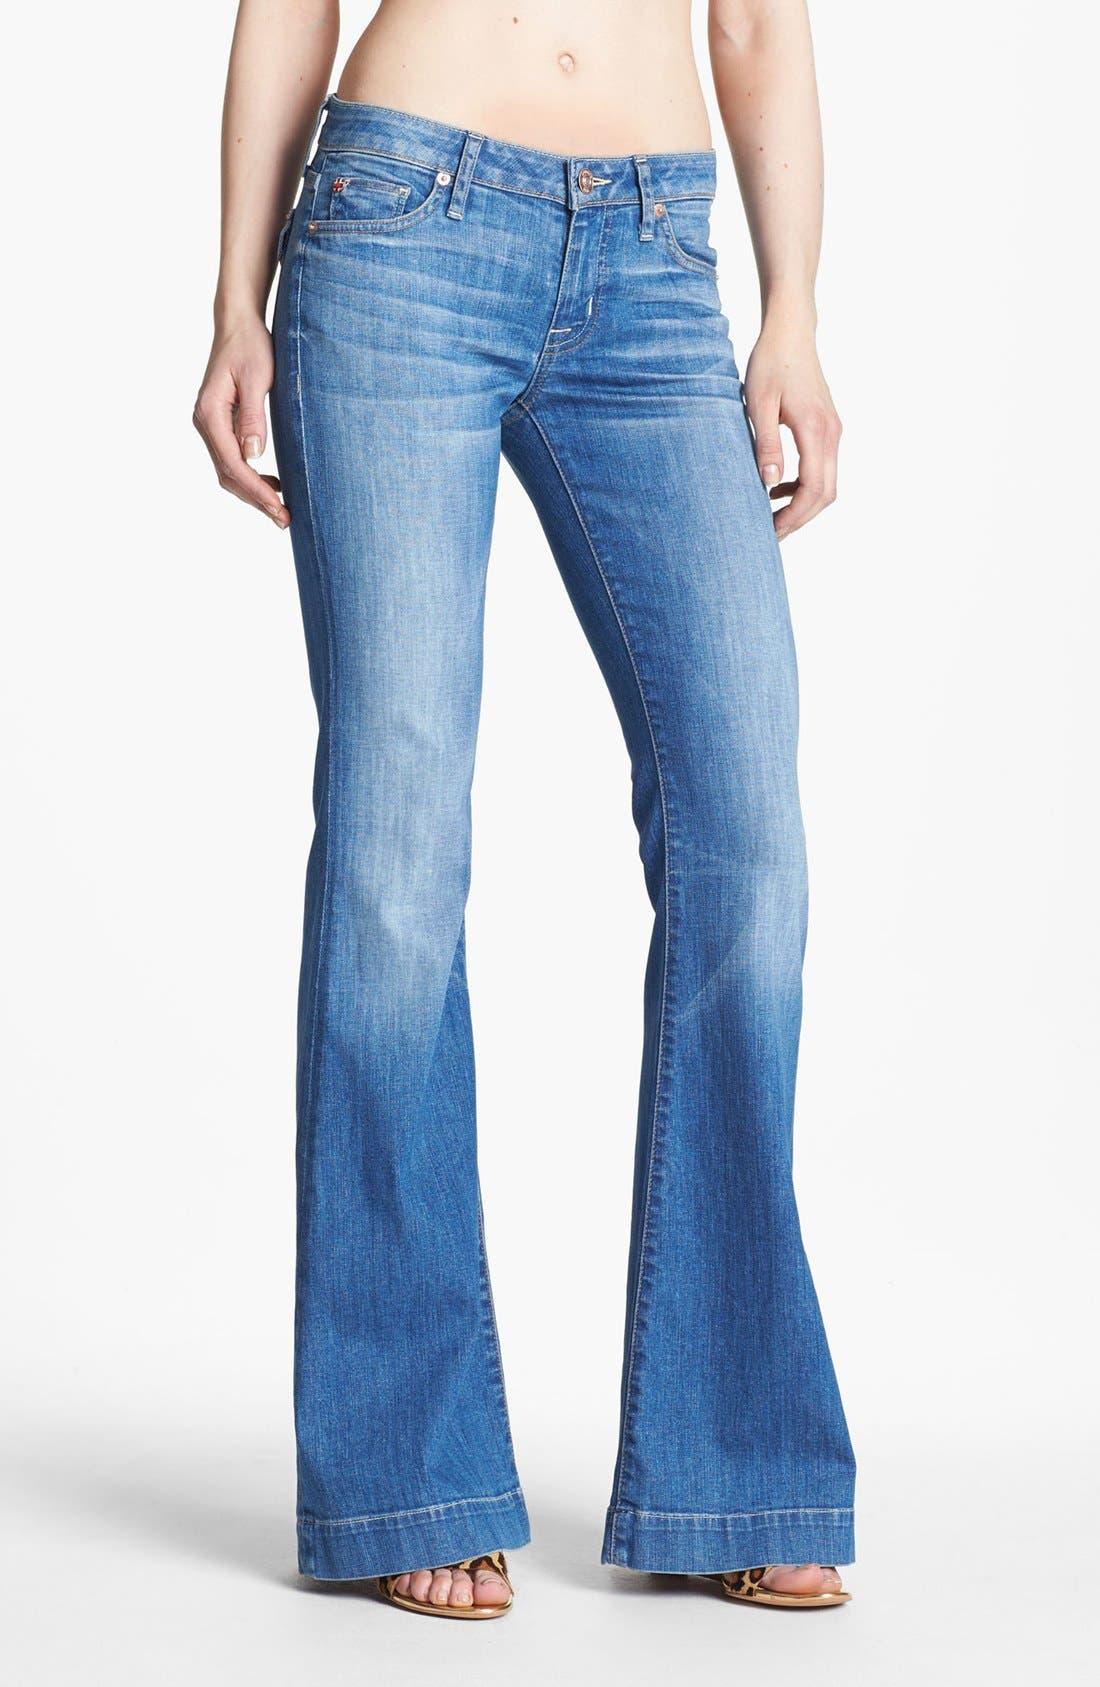 Alternate Image 1 Selected - Hudson Jeans 'Ferris' Flare Leg Jeans (Polly)